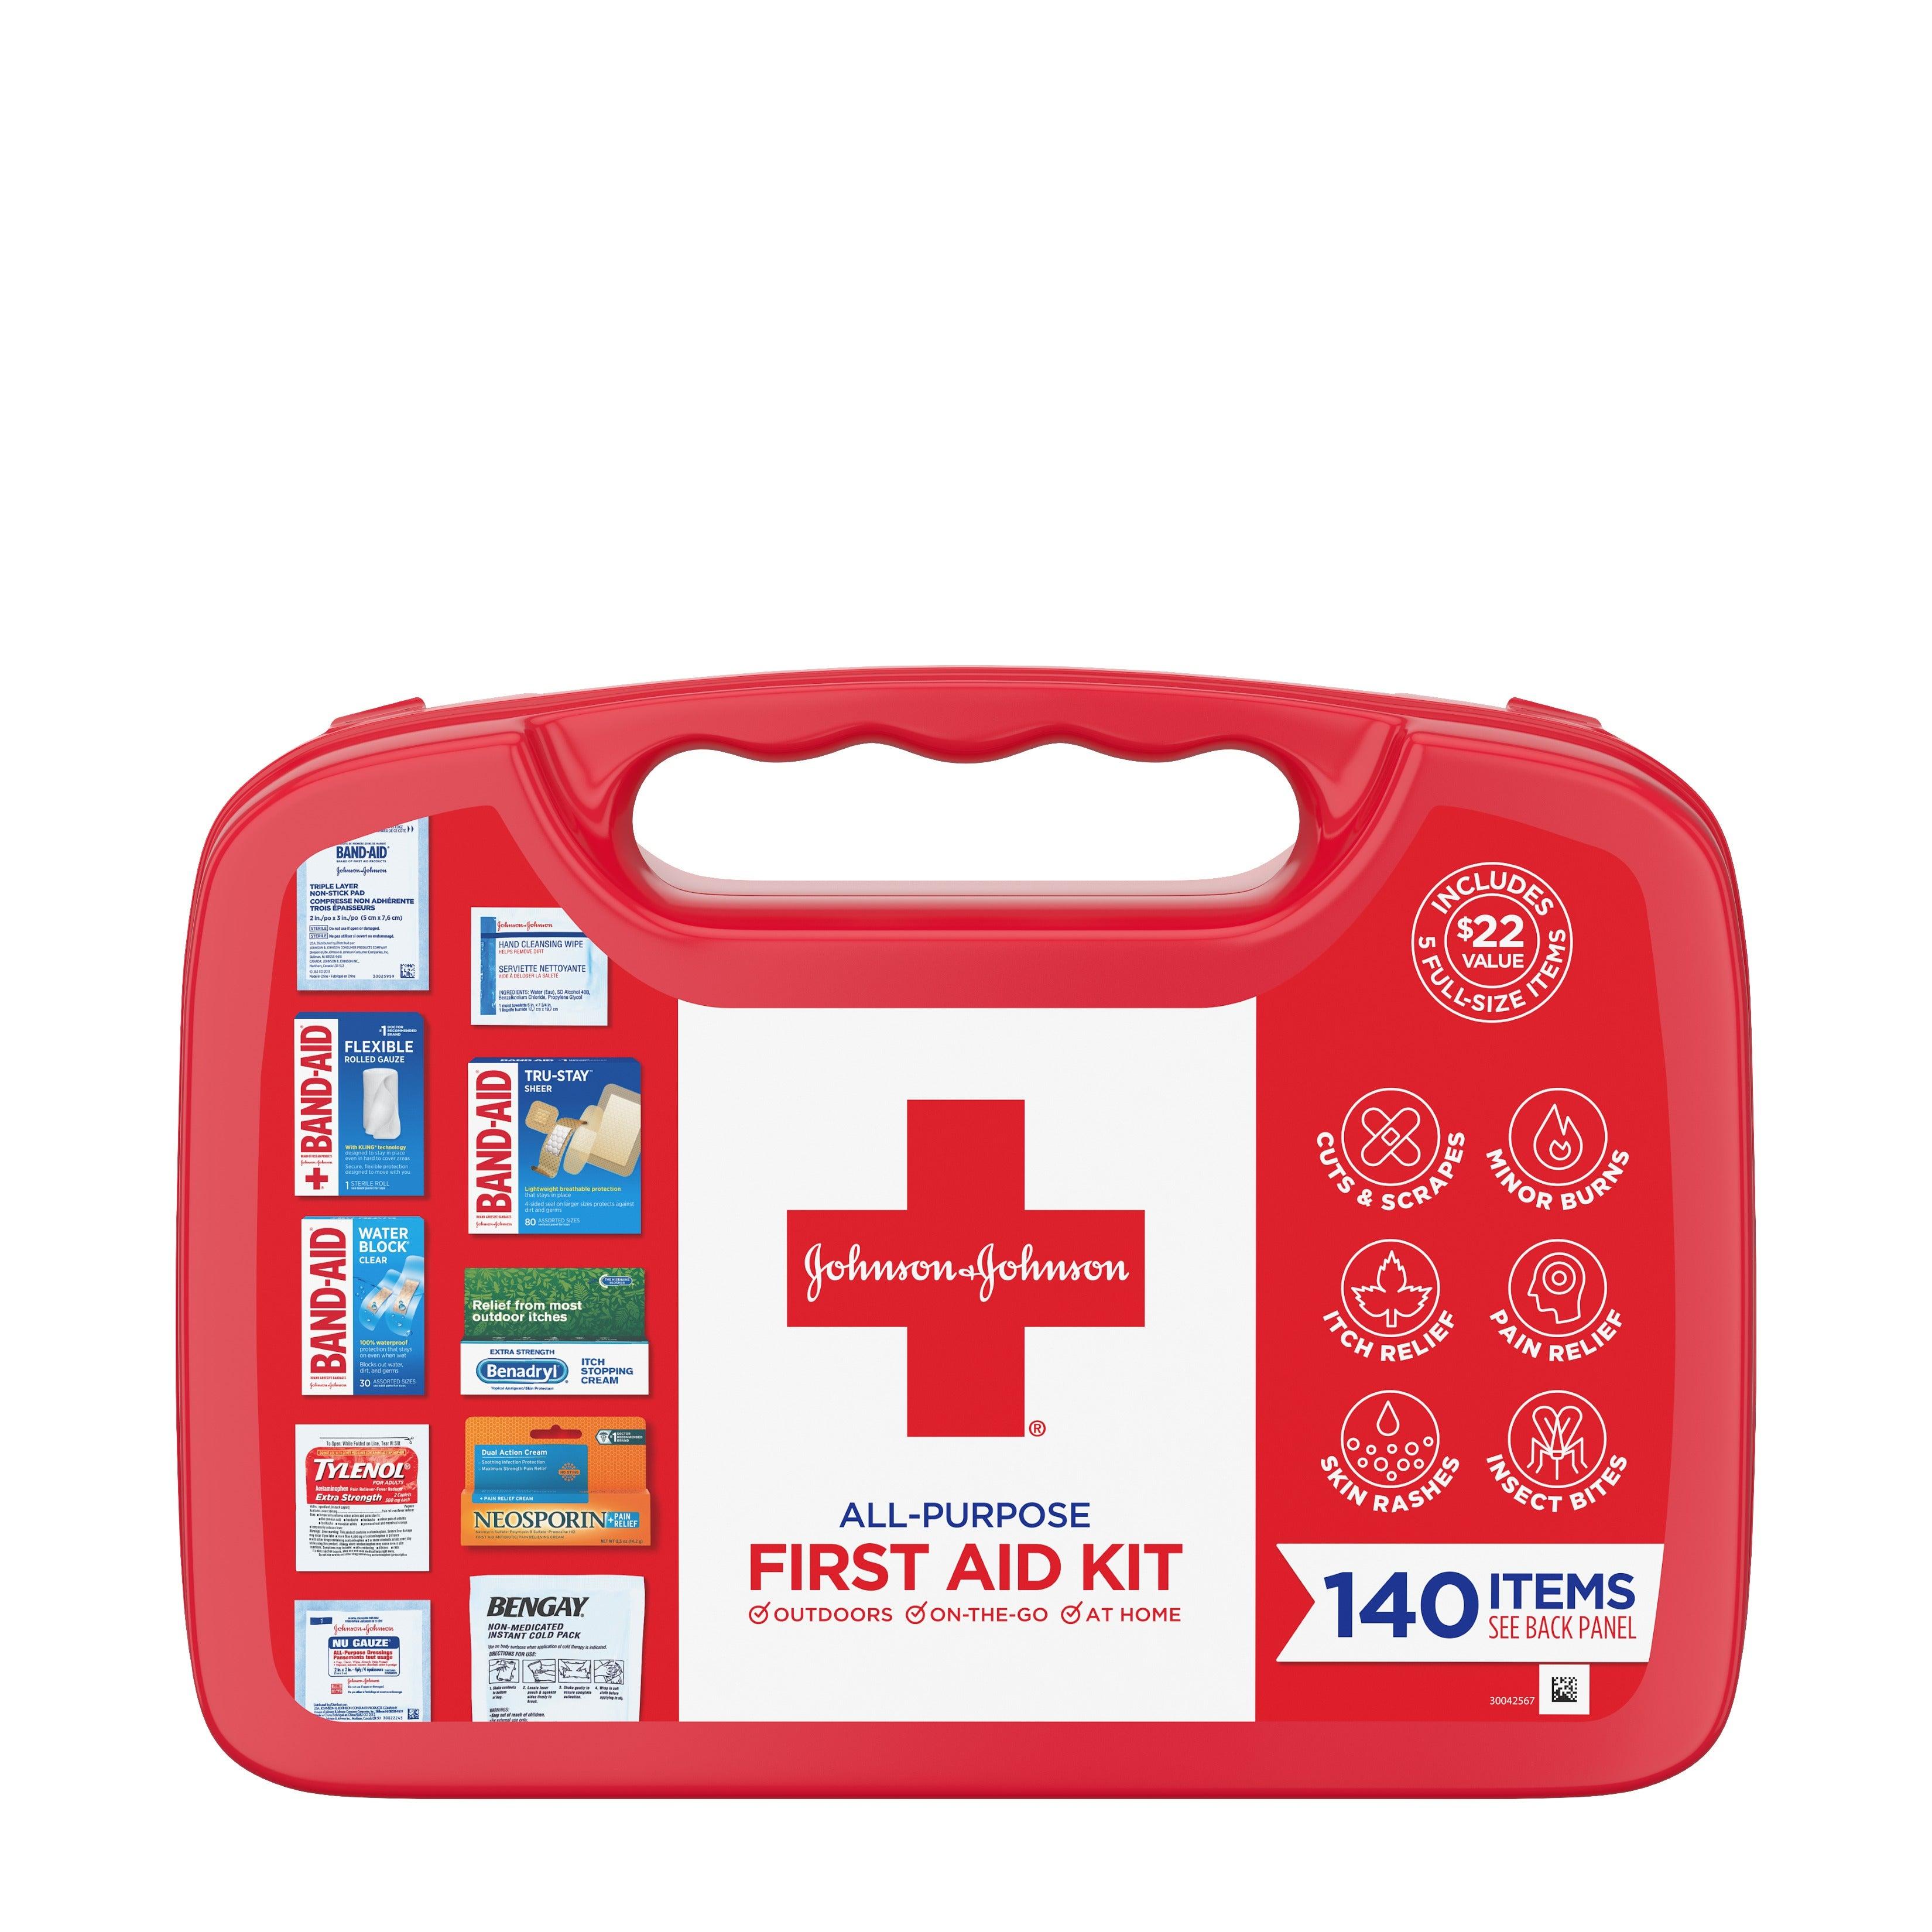 Johnson & Johnson All-Purpose Portable Compact First Aid Kit